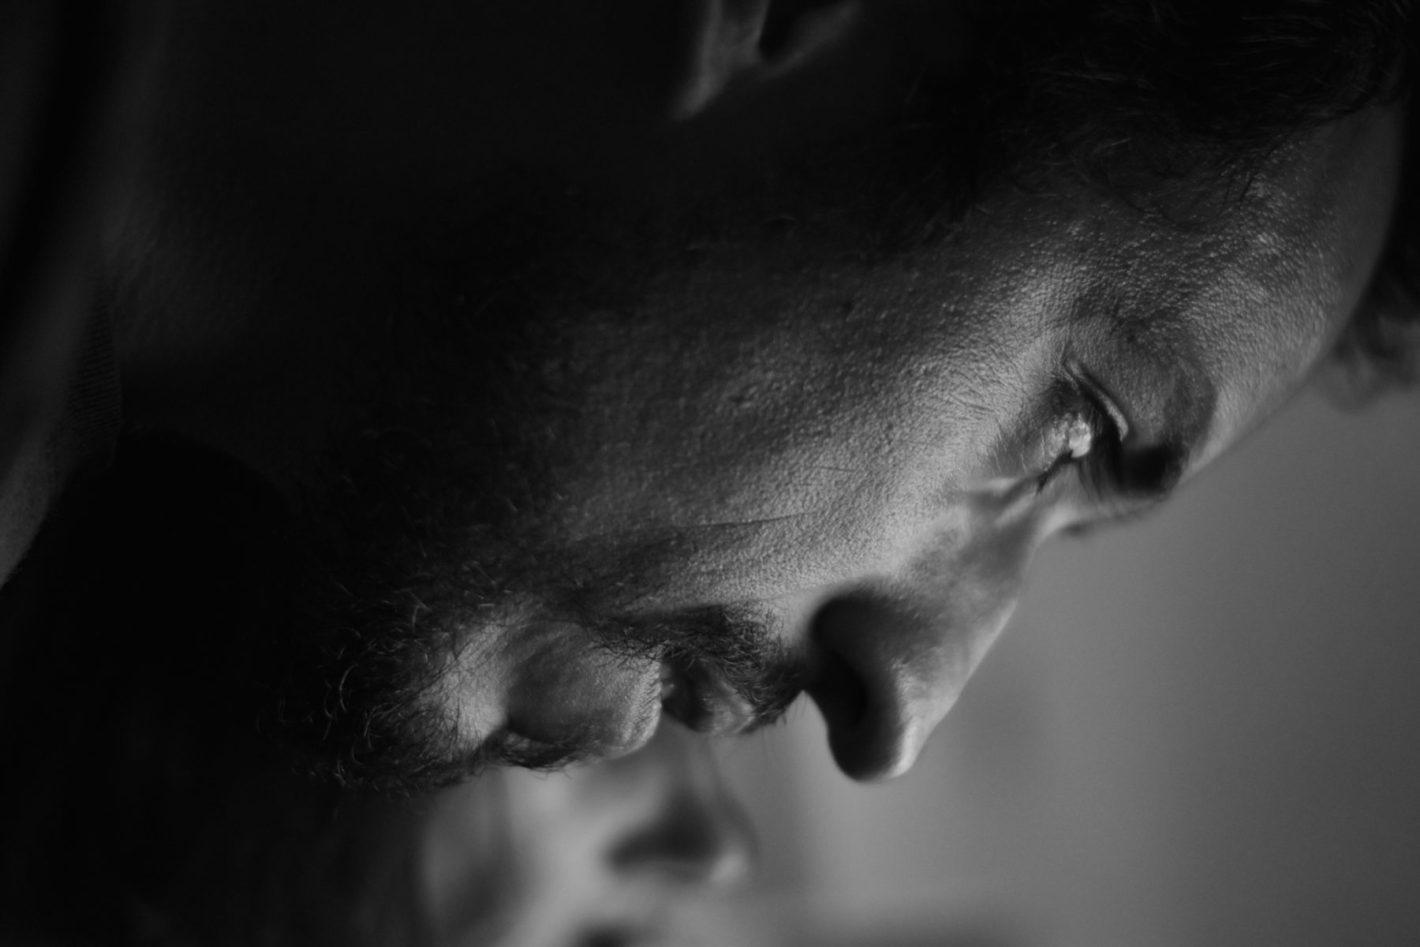 Portrait de Camilo Vieco